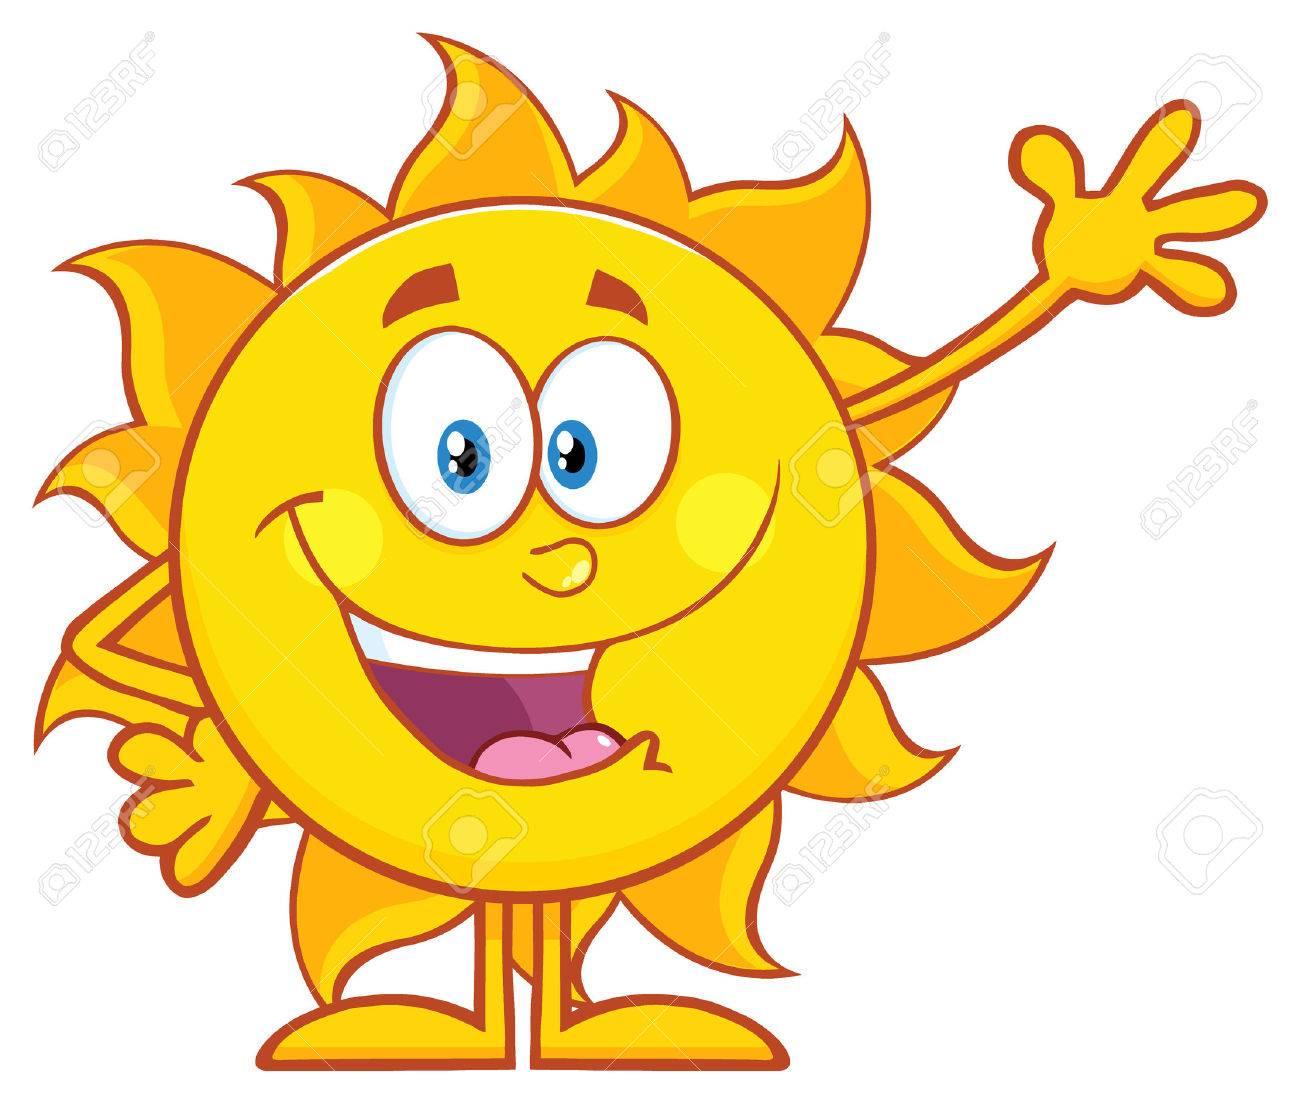 Happy Sun Cartoon Mascot Character Waving For Greeting - 59119593